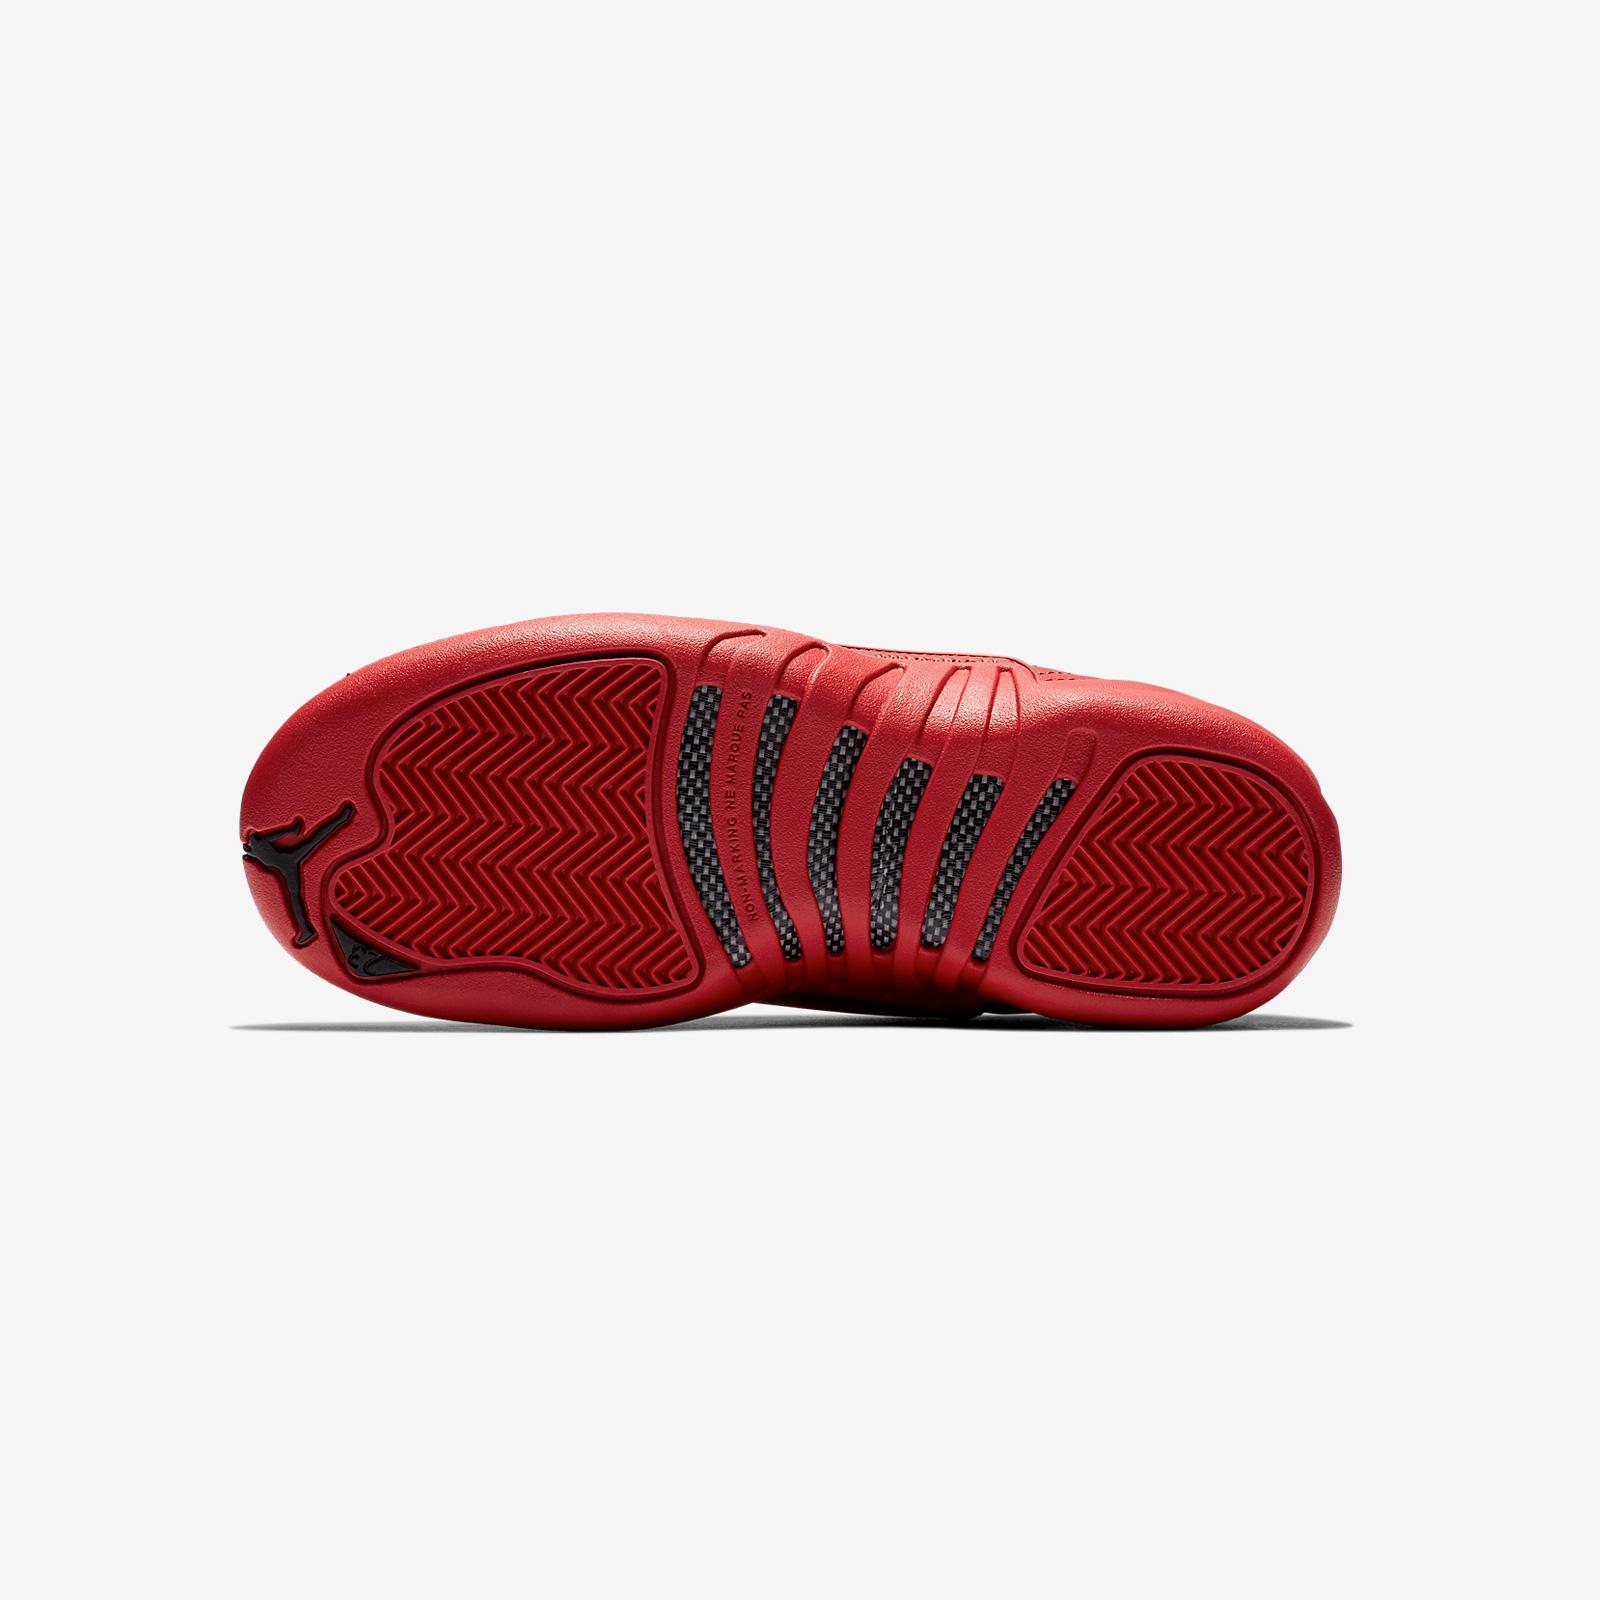 fd142cc5172a Jordan Brand Air Jordan 12 Retro (GS) - 153265-601 - Sneakersnstuff ...